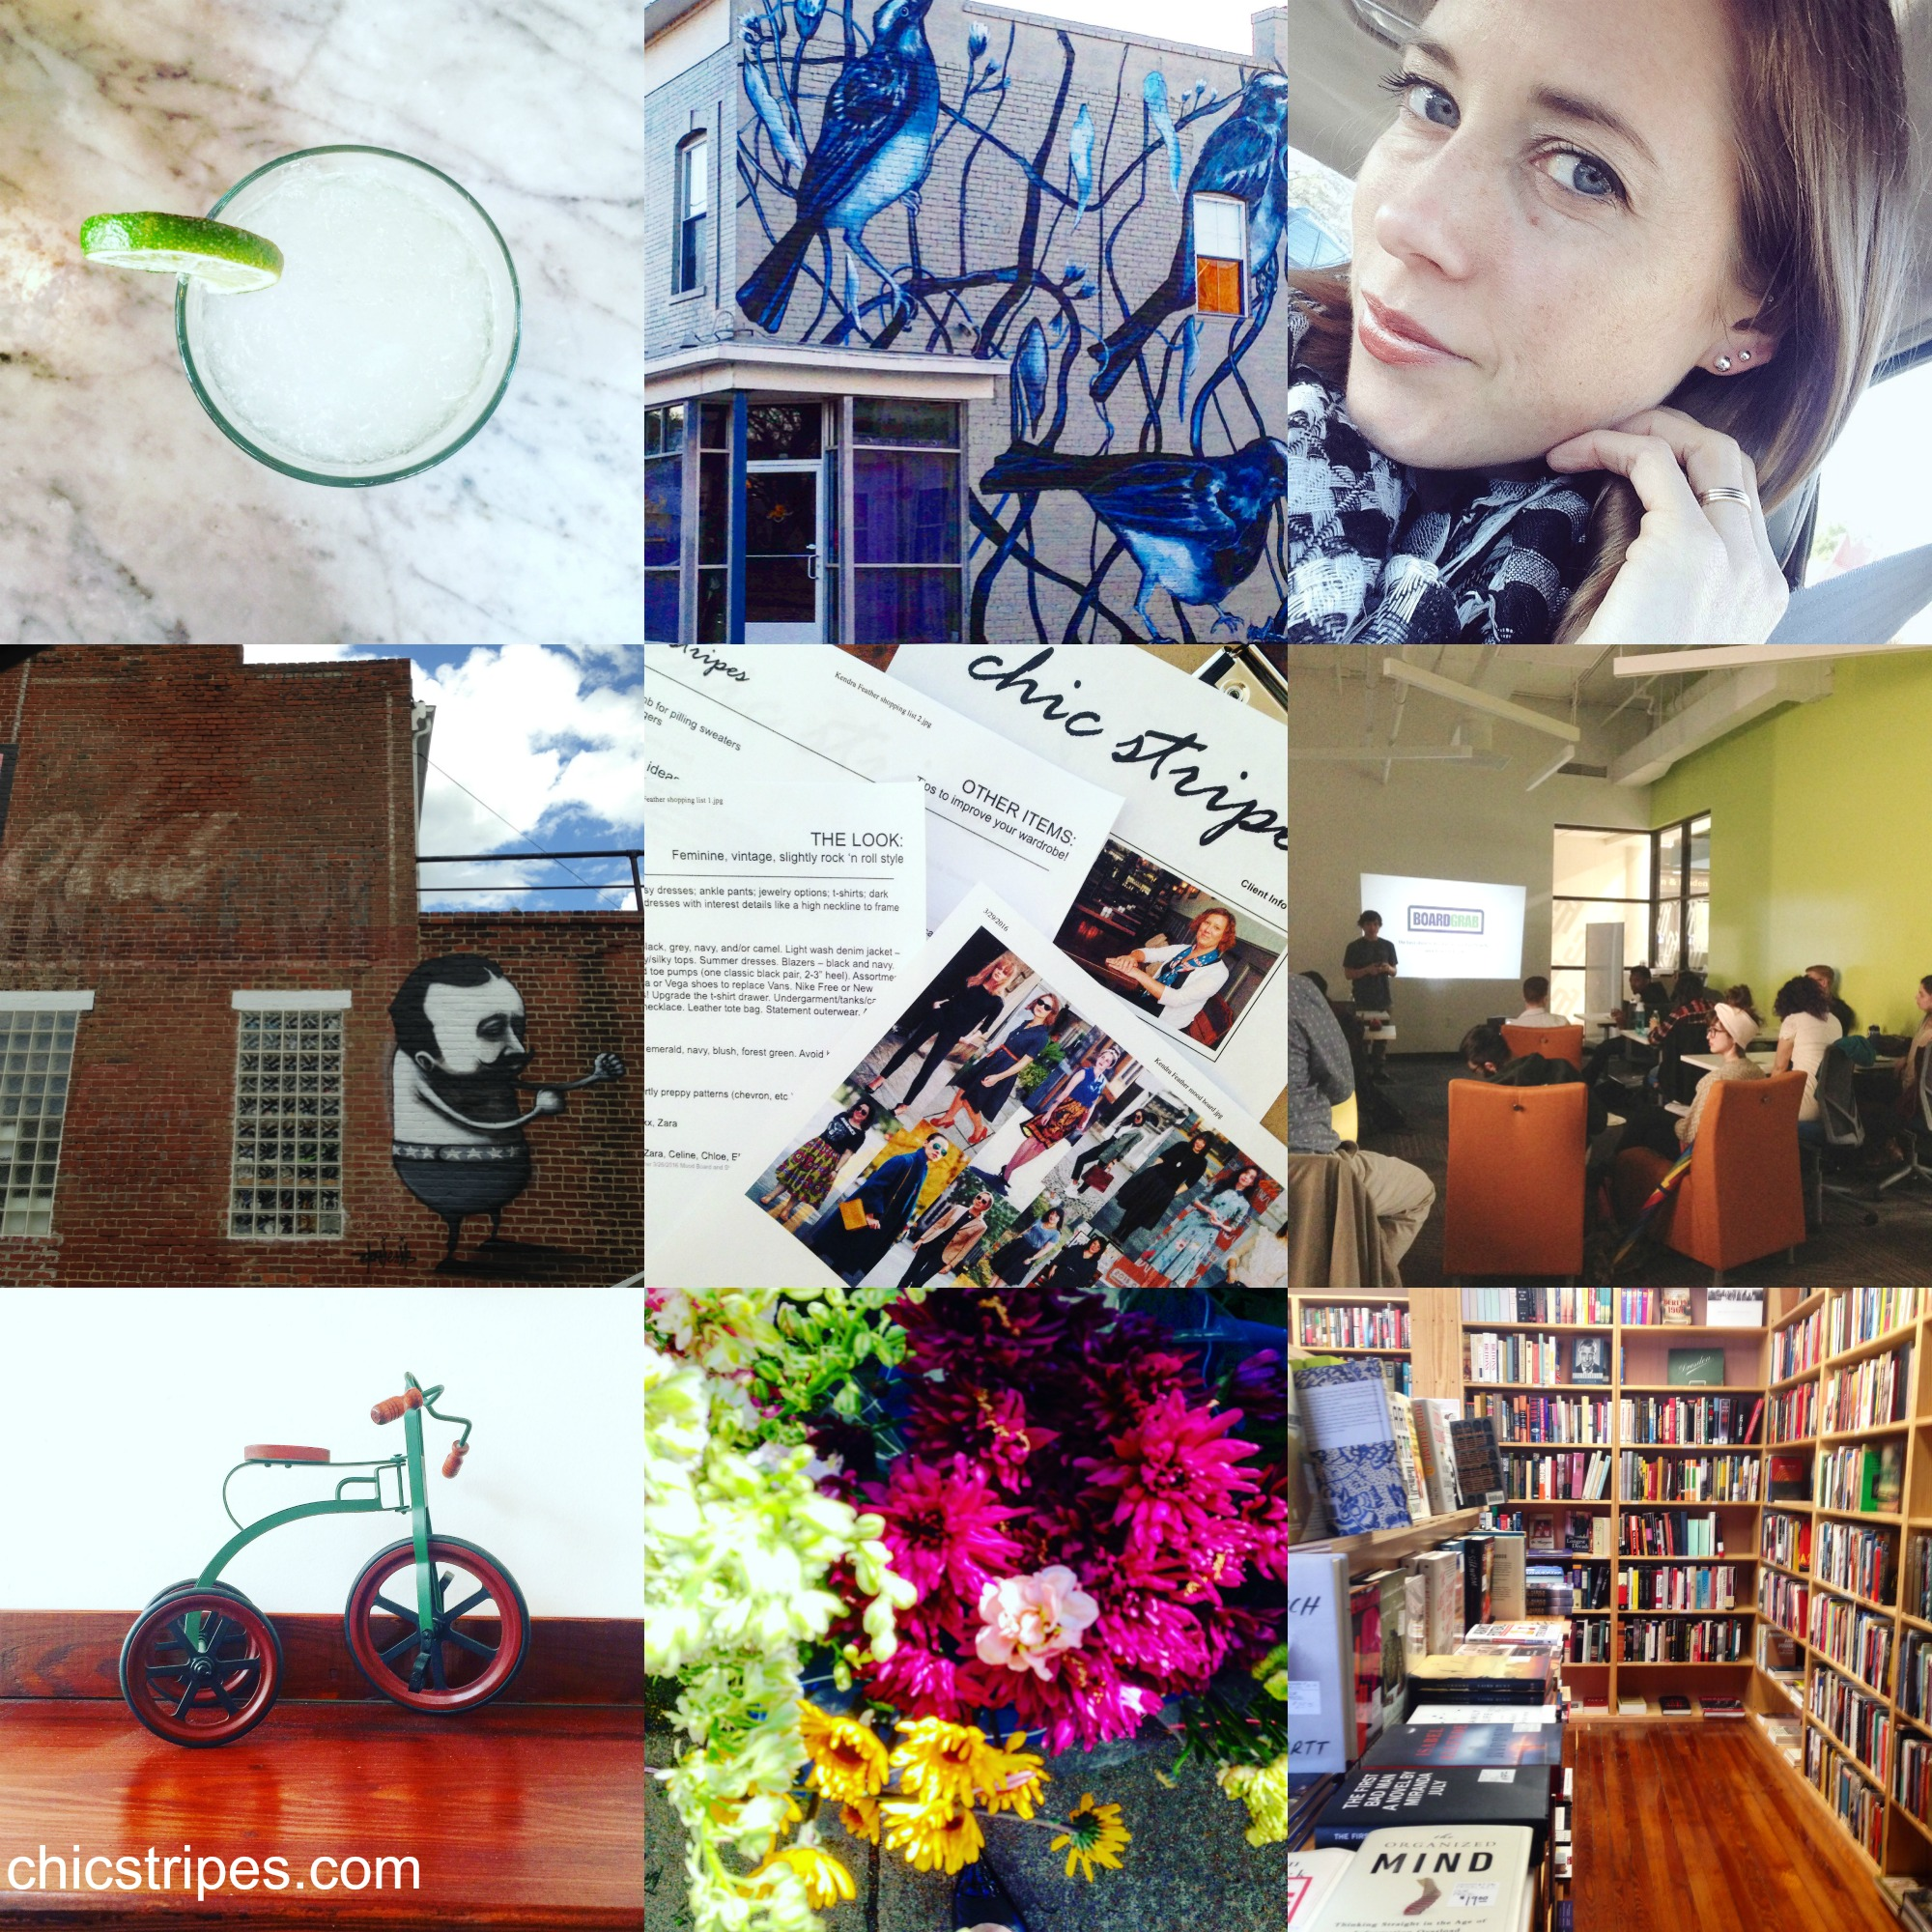 Chic-Stripes-Business-Freelance-Life-1.jpg